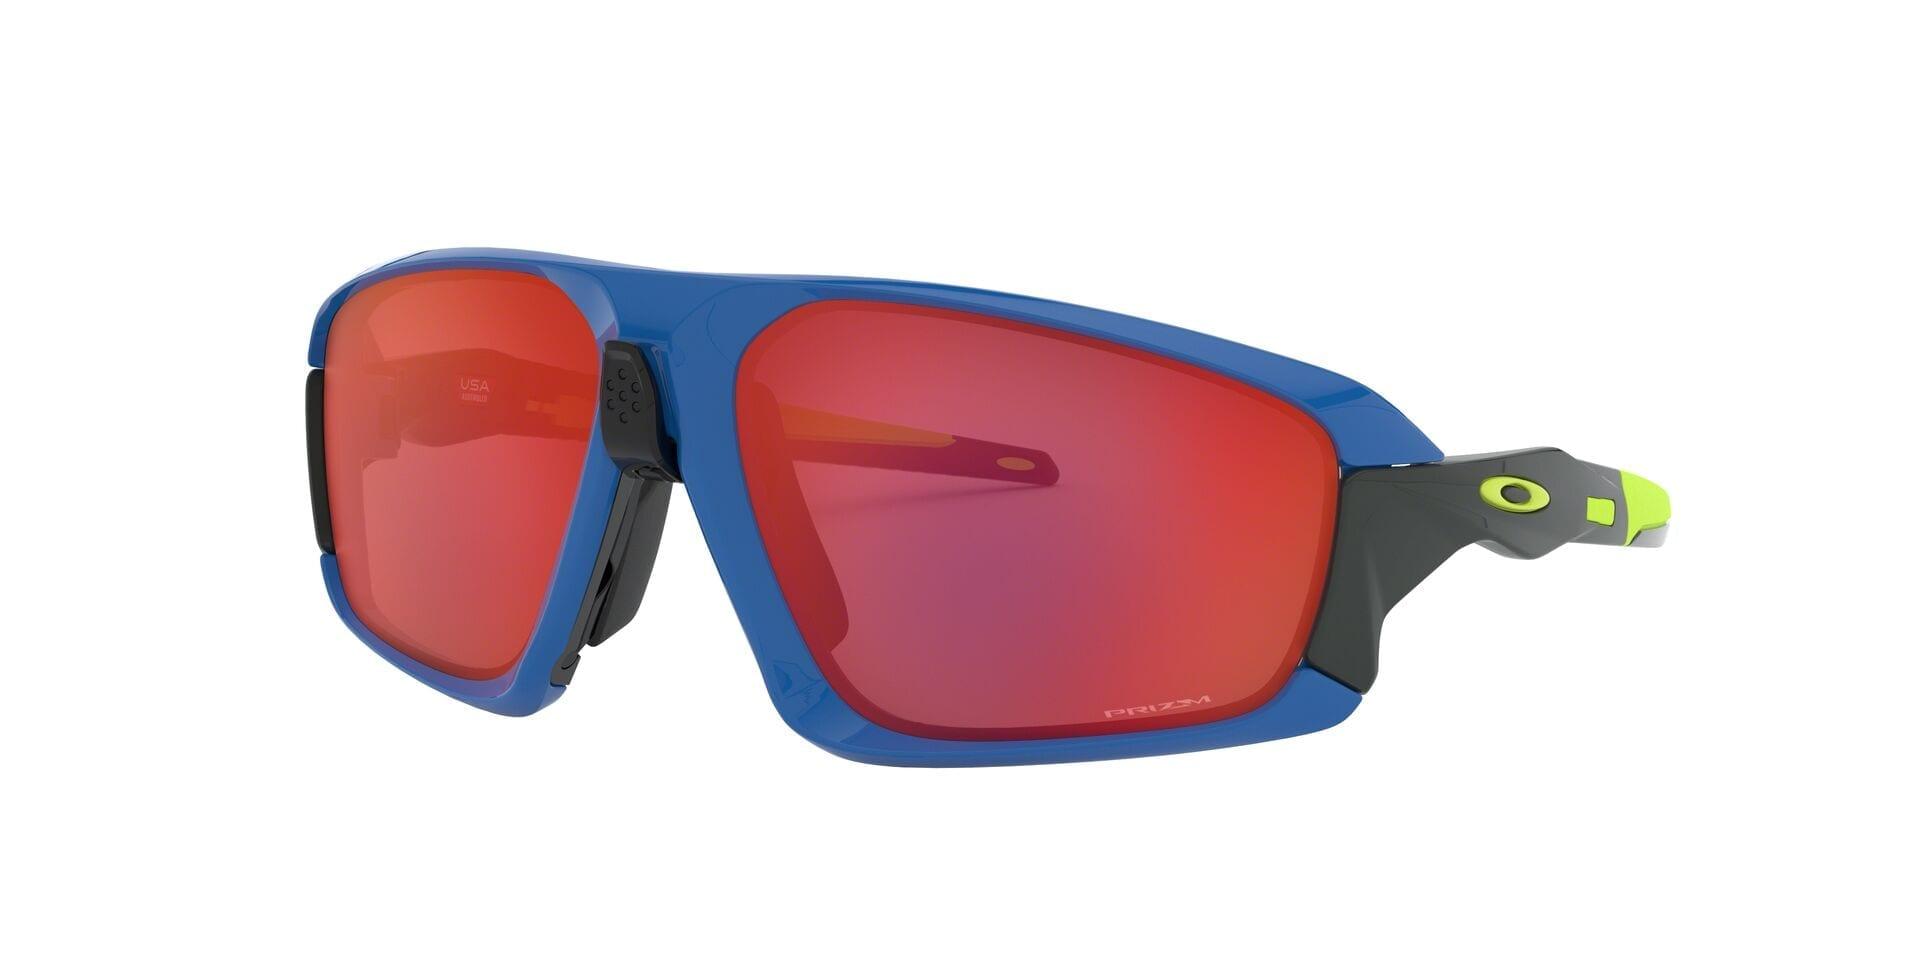 5b25e9bb1f Oakley Holbrook XS Sunglasses - ADS Lifestyle